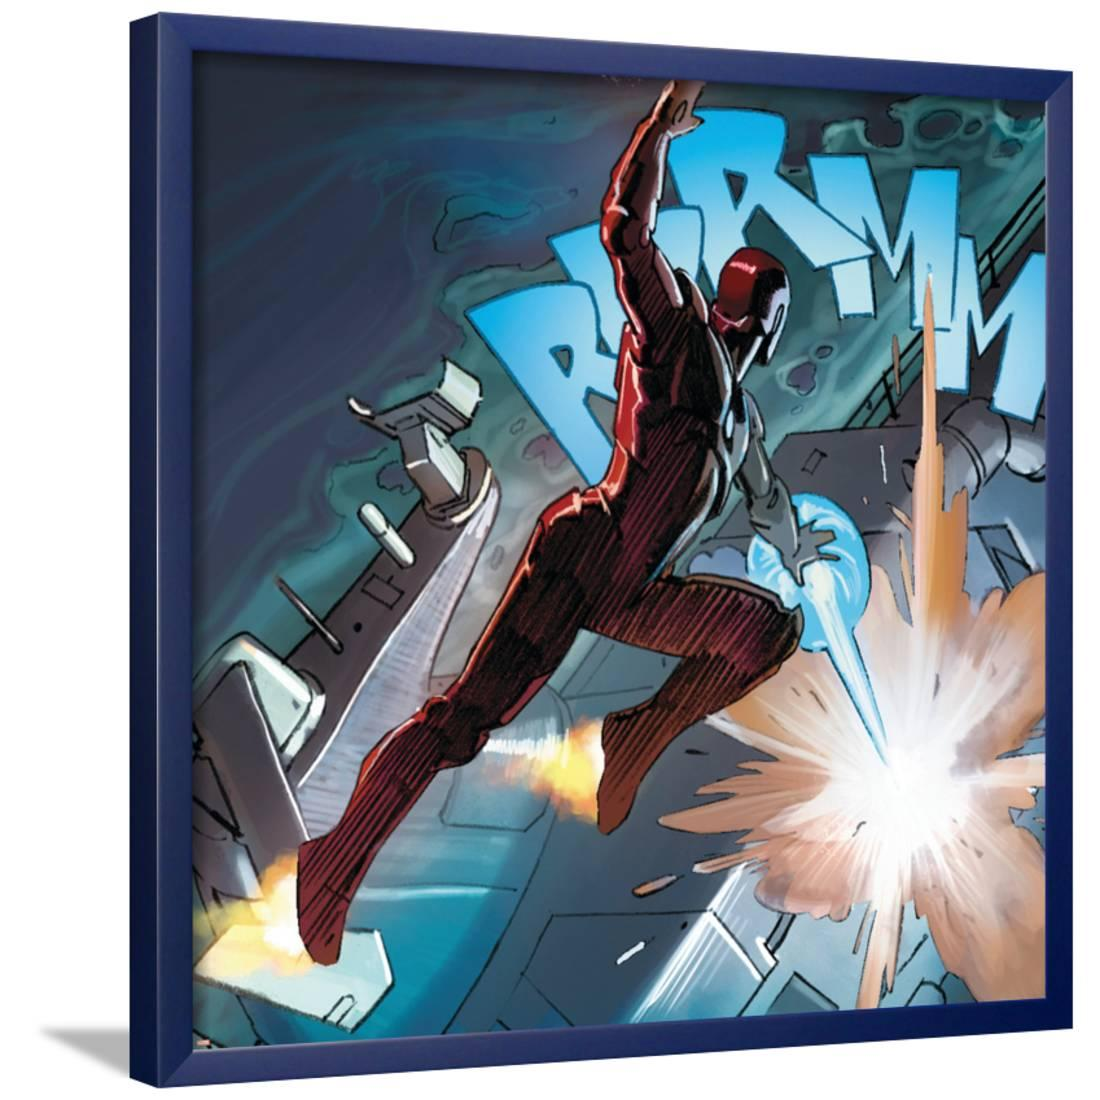 Avengers Assemble Style Guide: Iron Man Framed Poster Wall Art